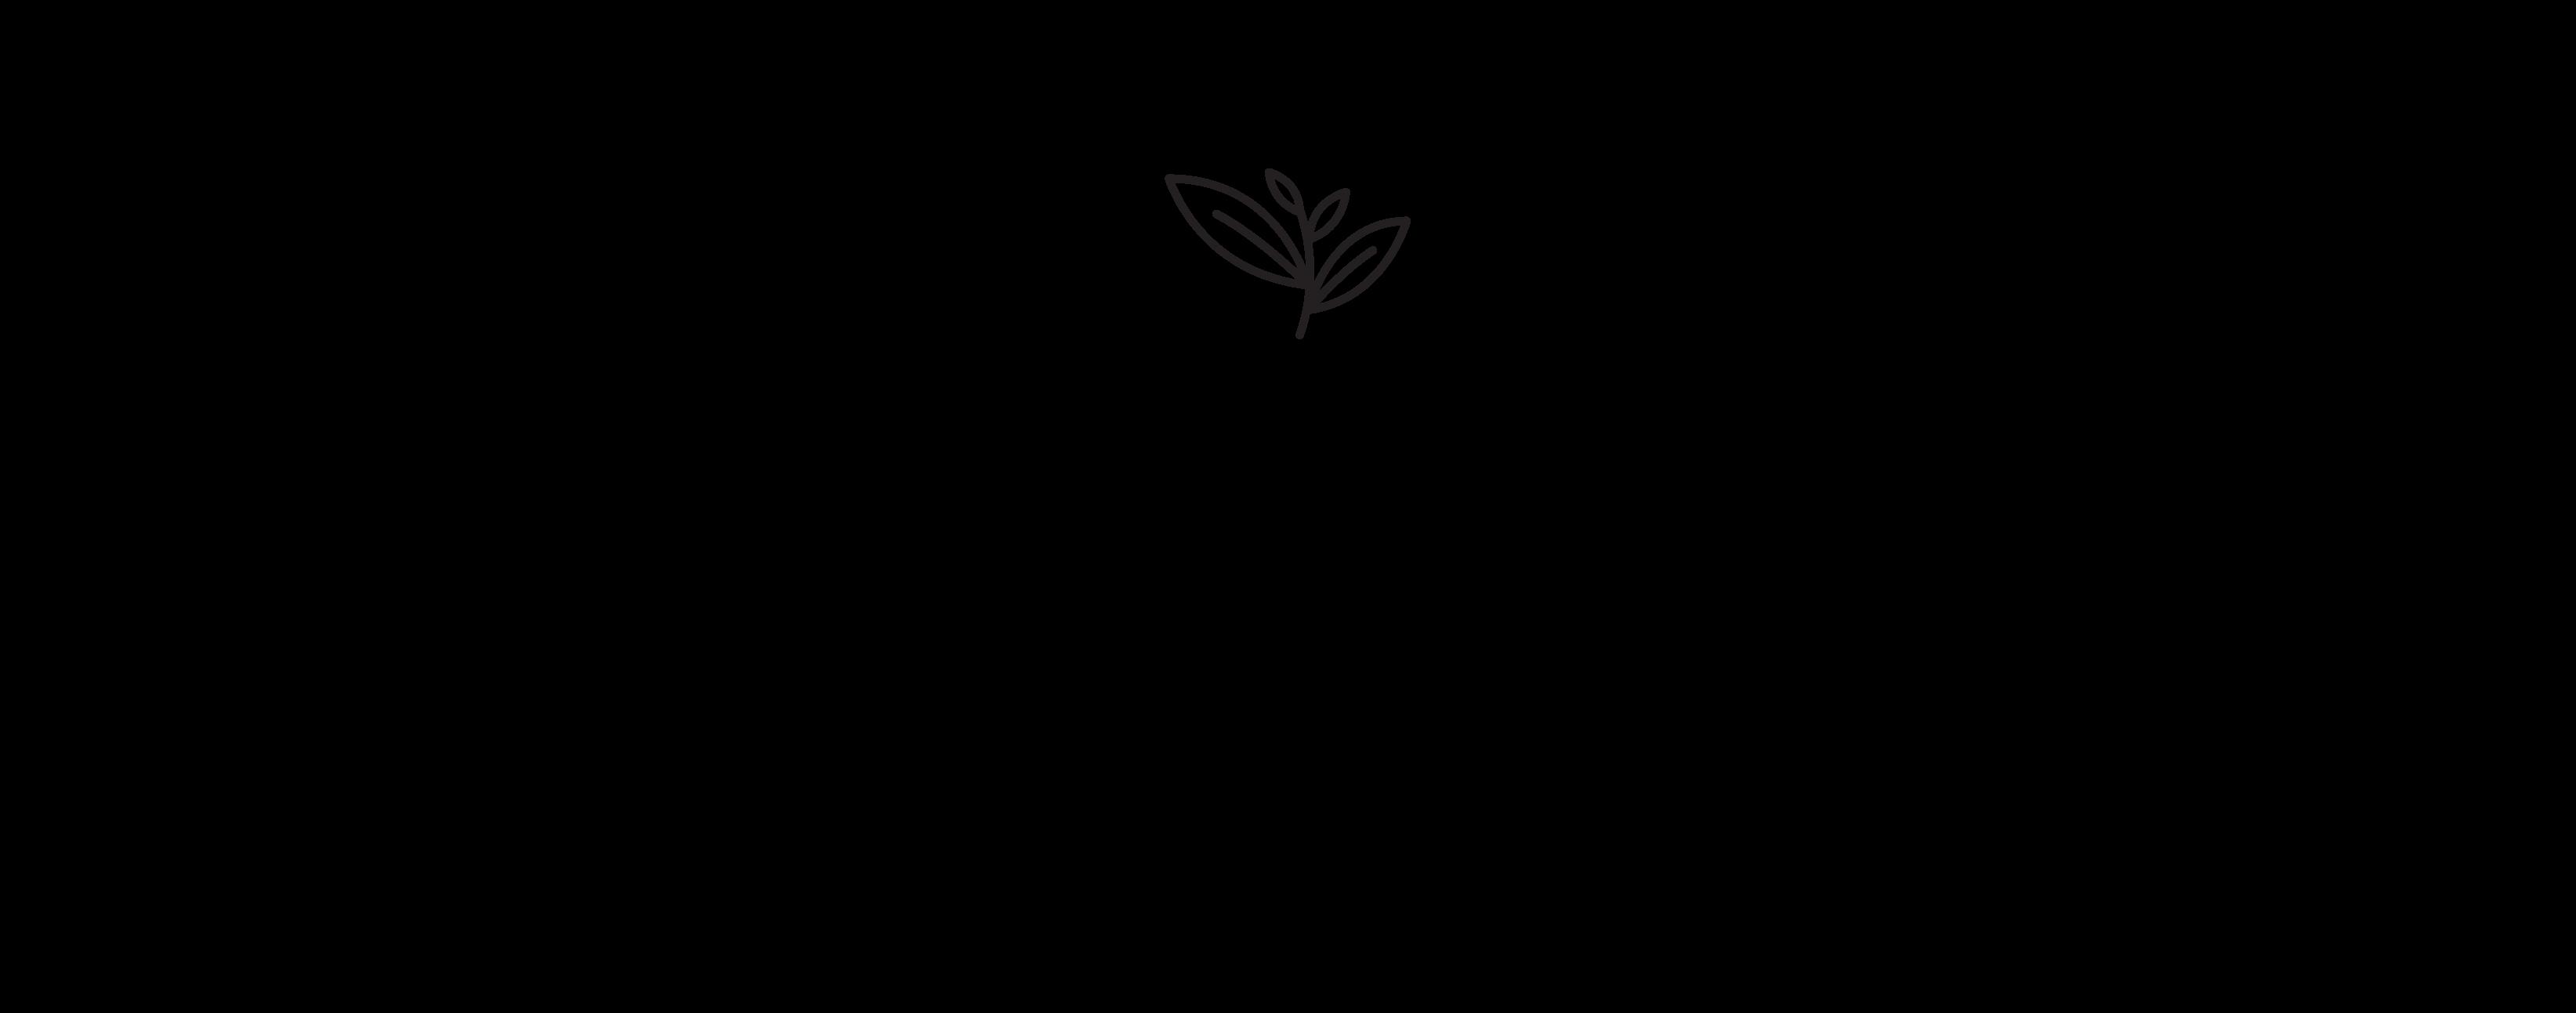 https://hjskincare.com/wp-content/uploads/2021/02/cropped-HaleyJenae3_Logo.png